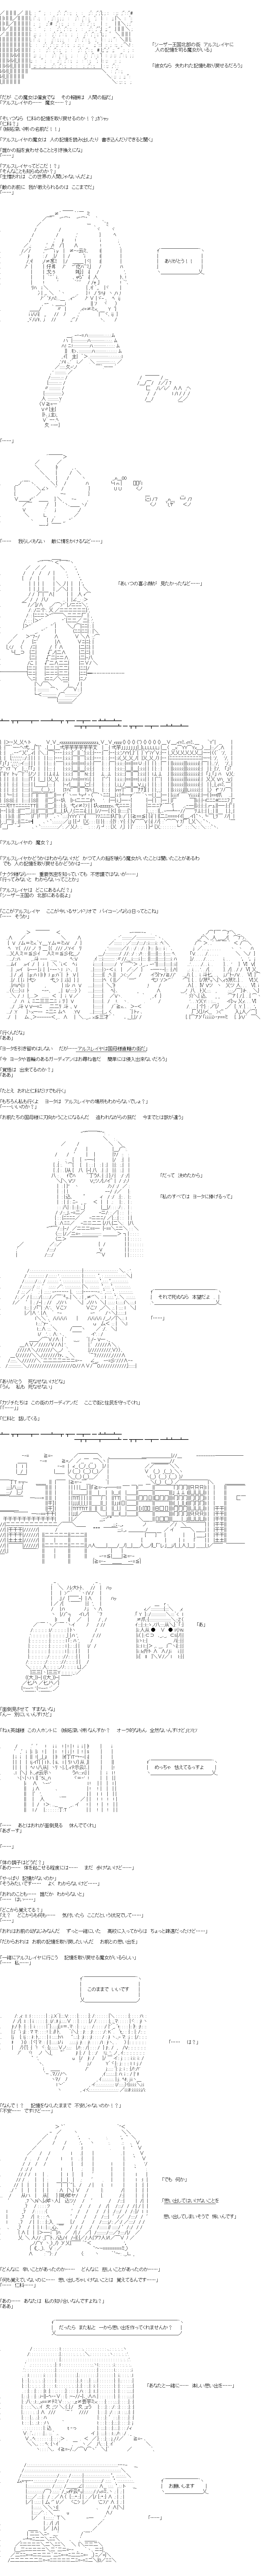 f:id:bottle512:20200419192801p:plain